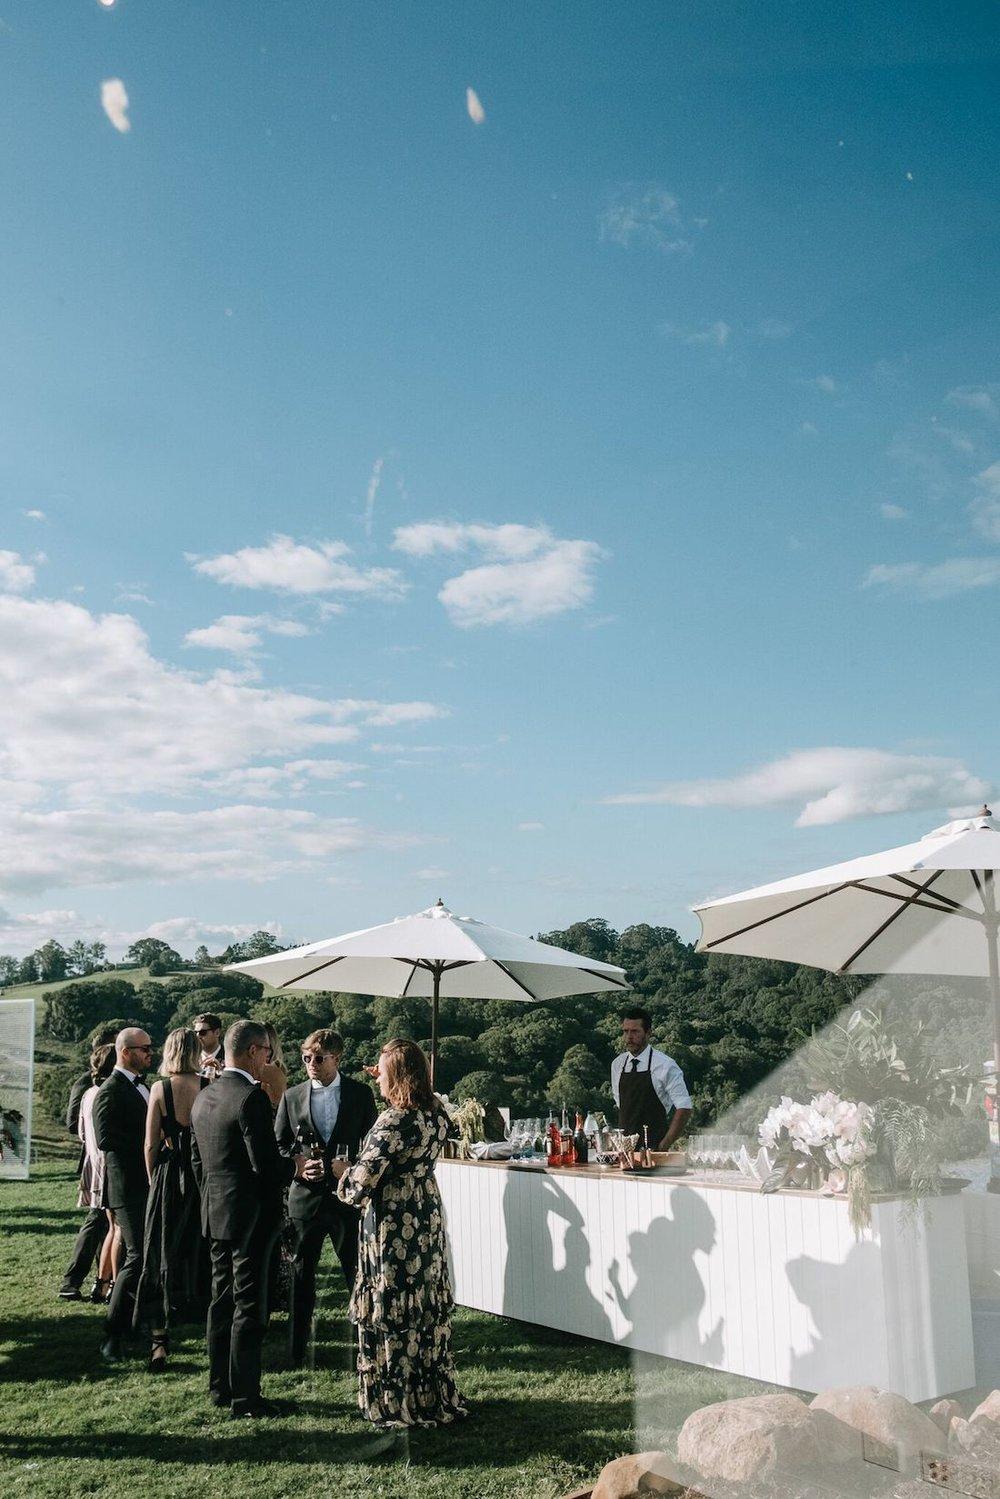 Wedding+bar+styling+ideas+inspiration+Hampton+Event+Hire25.jpeg